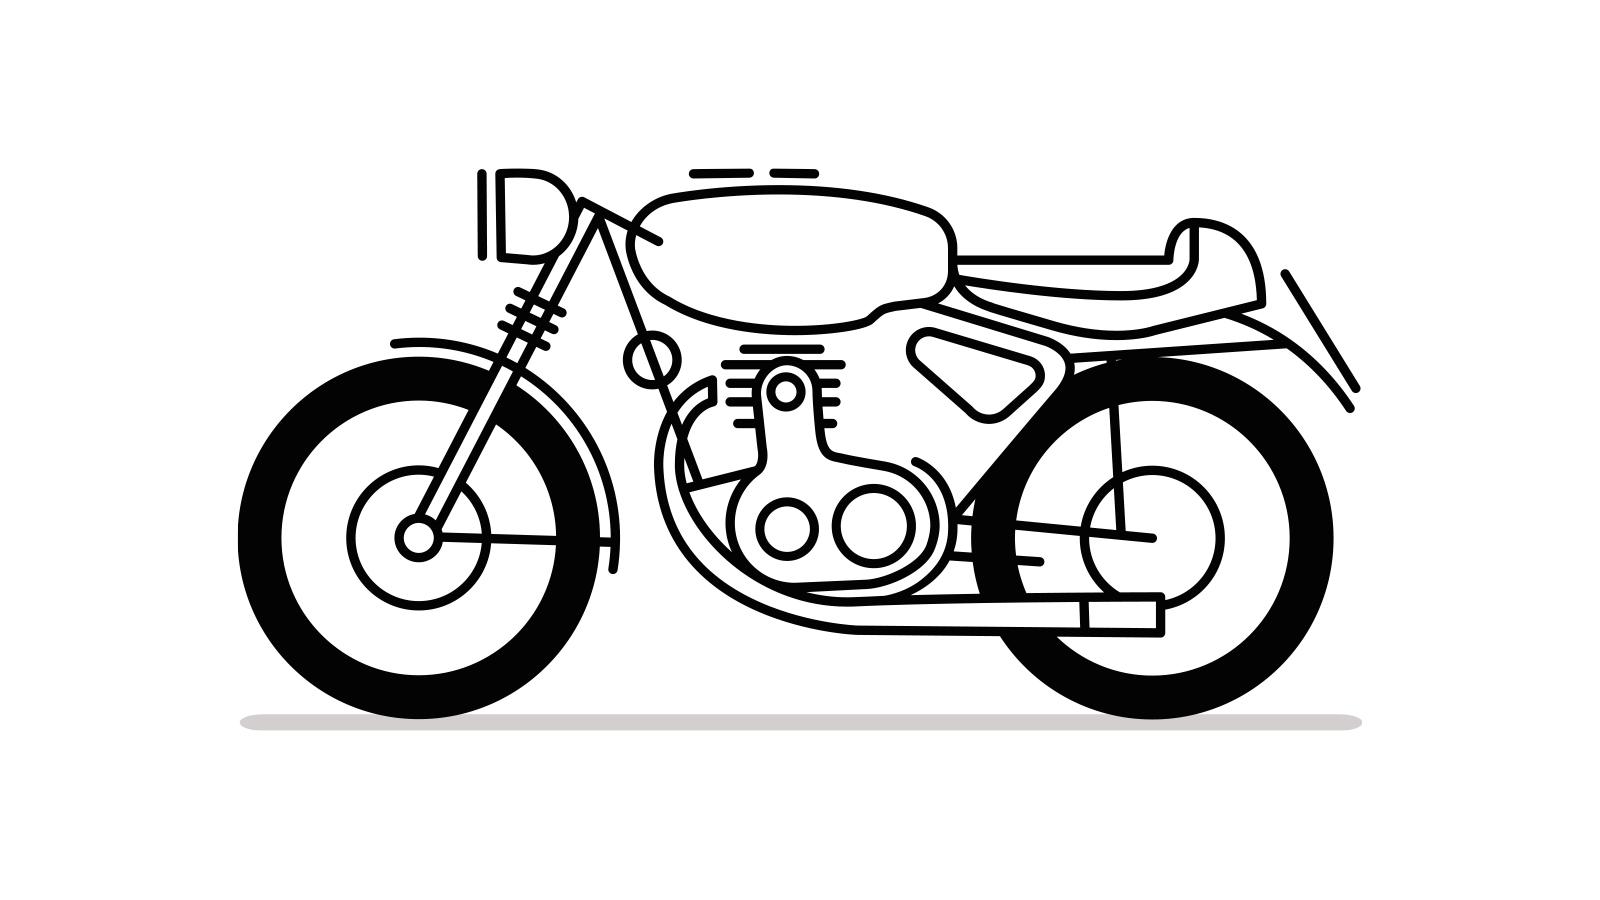 pitok motor museum on behance 1968 Honda CL350 Specs